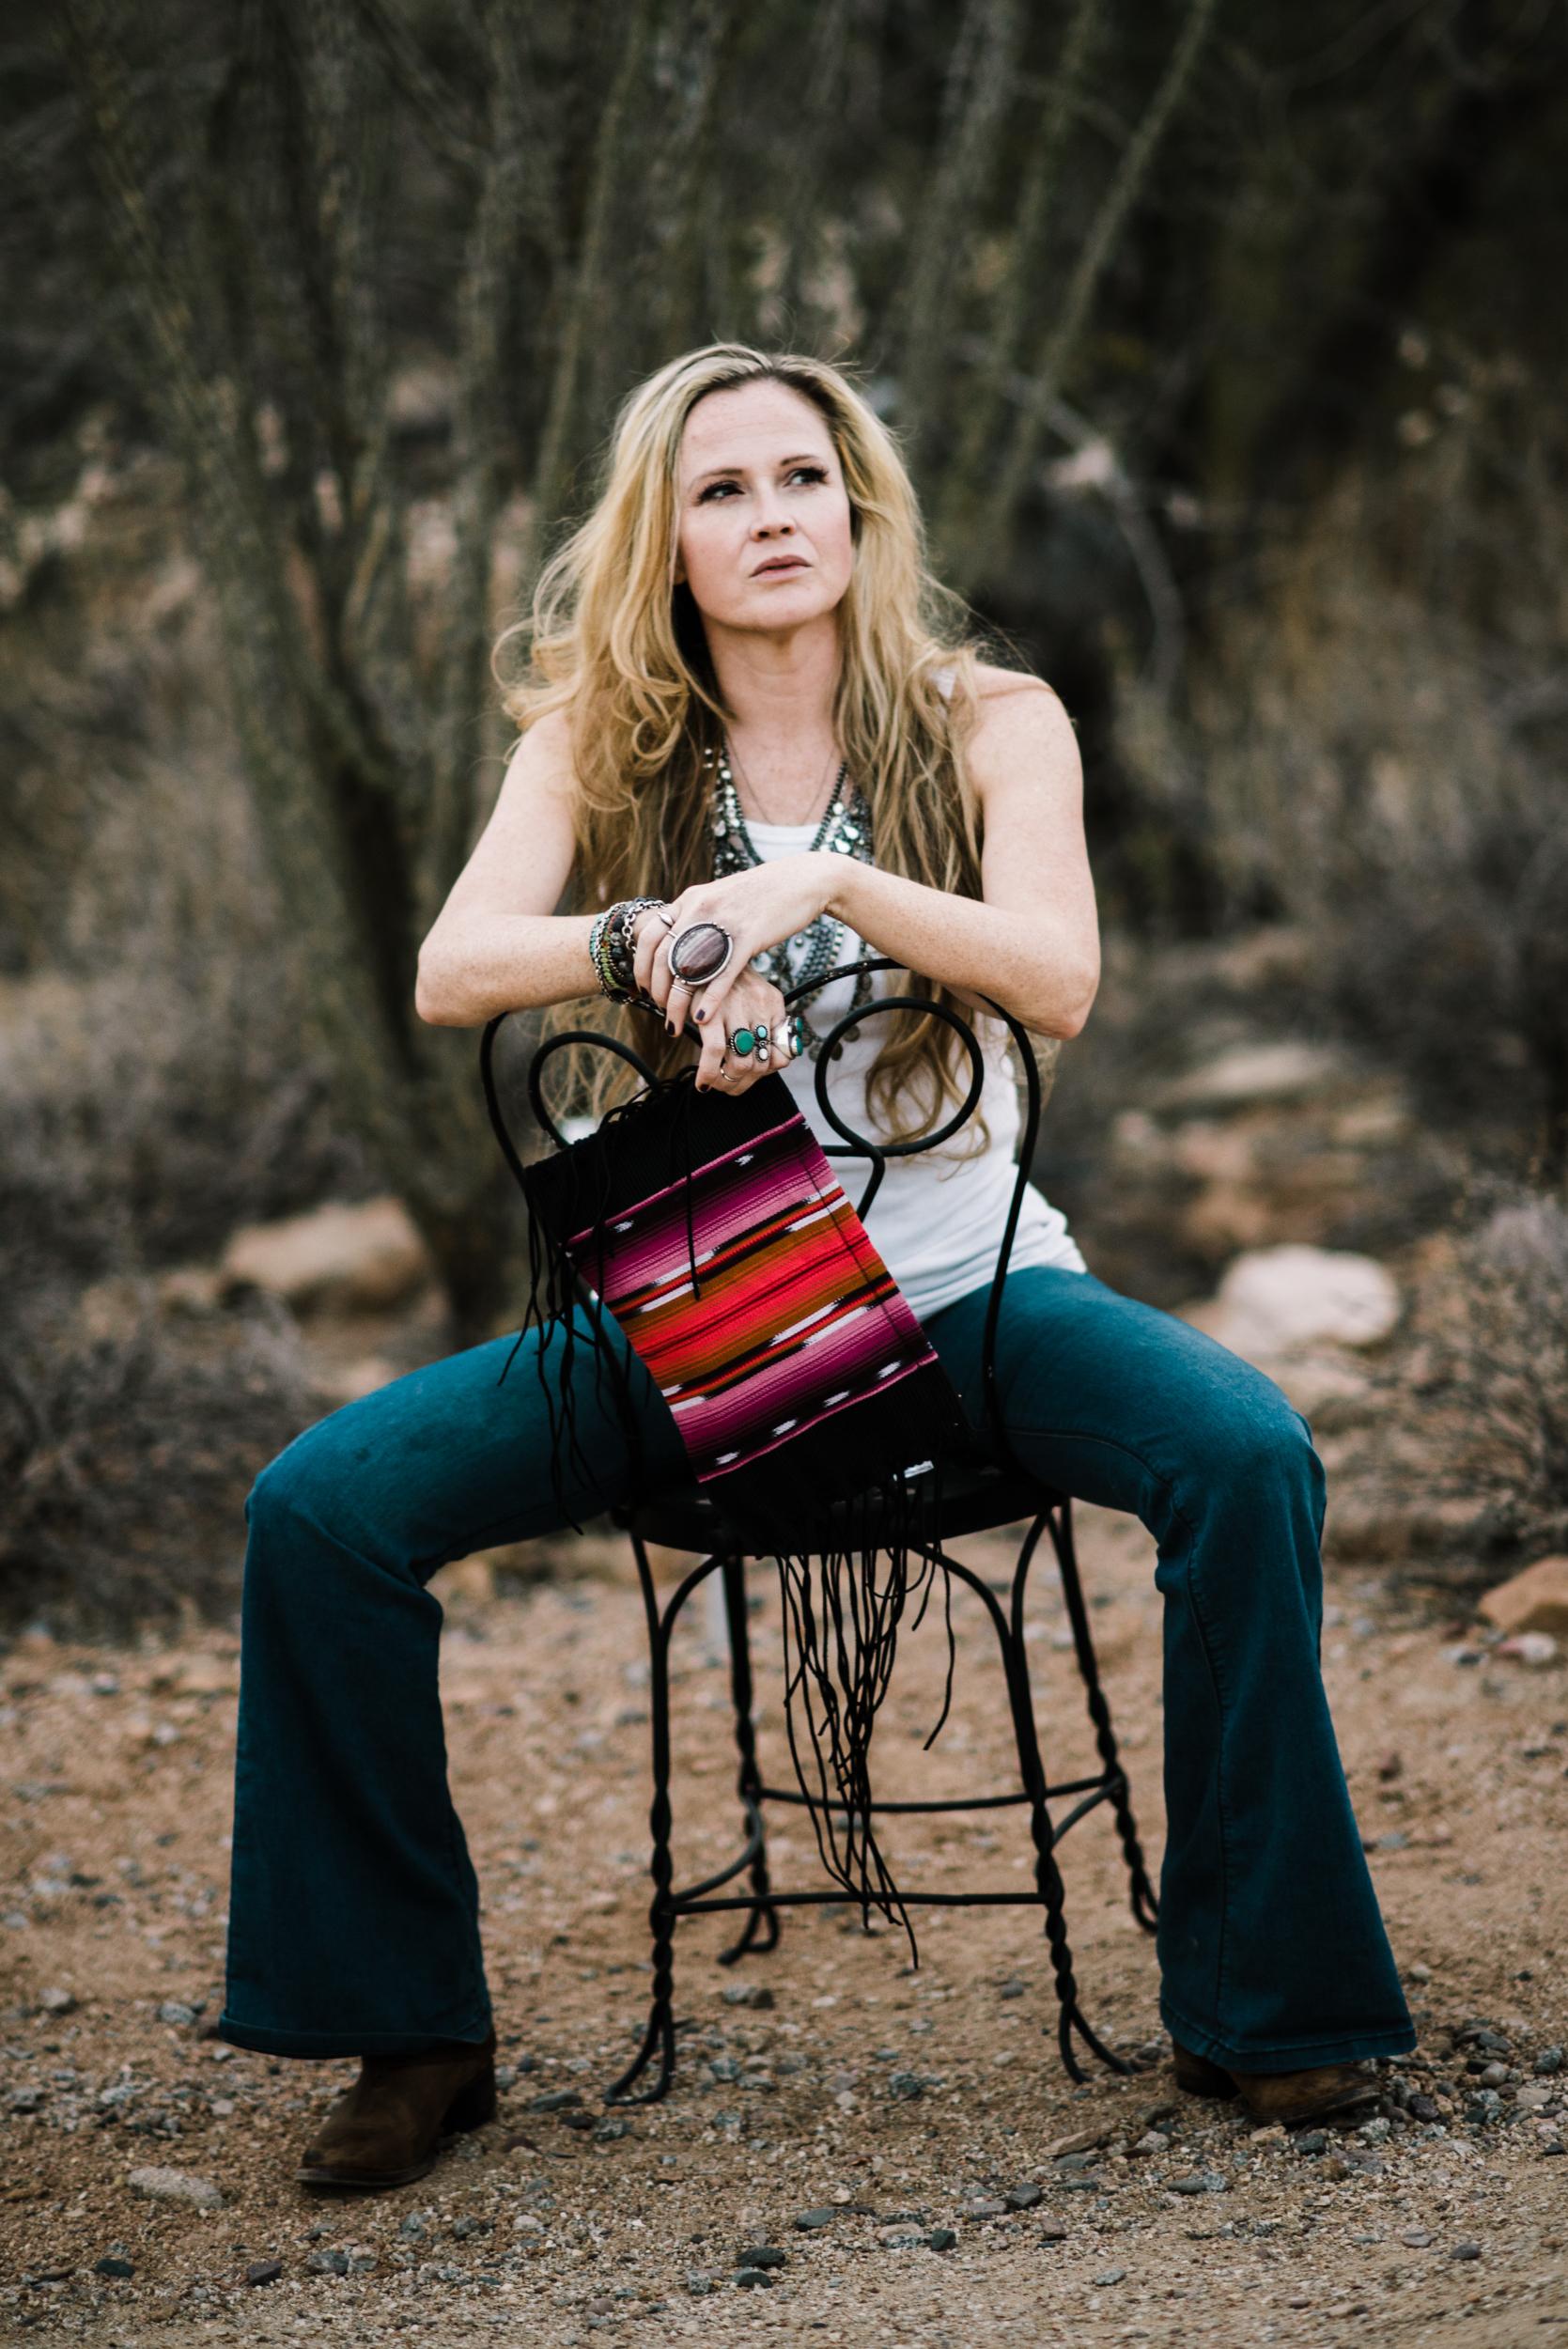 Arizona-love-hippie-momma-bags-boho-19.jpg